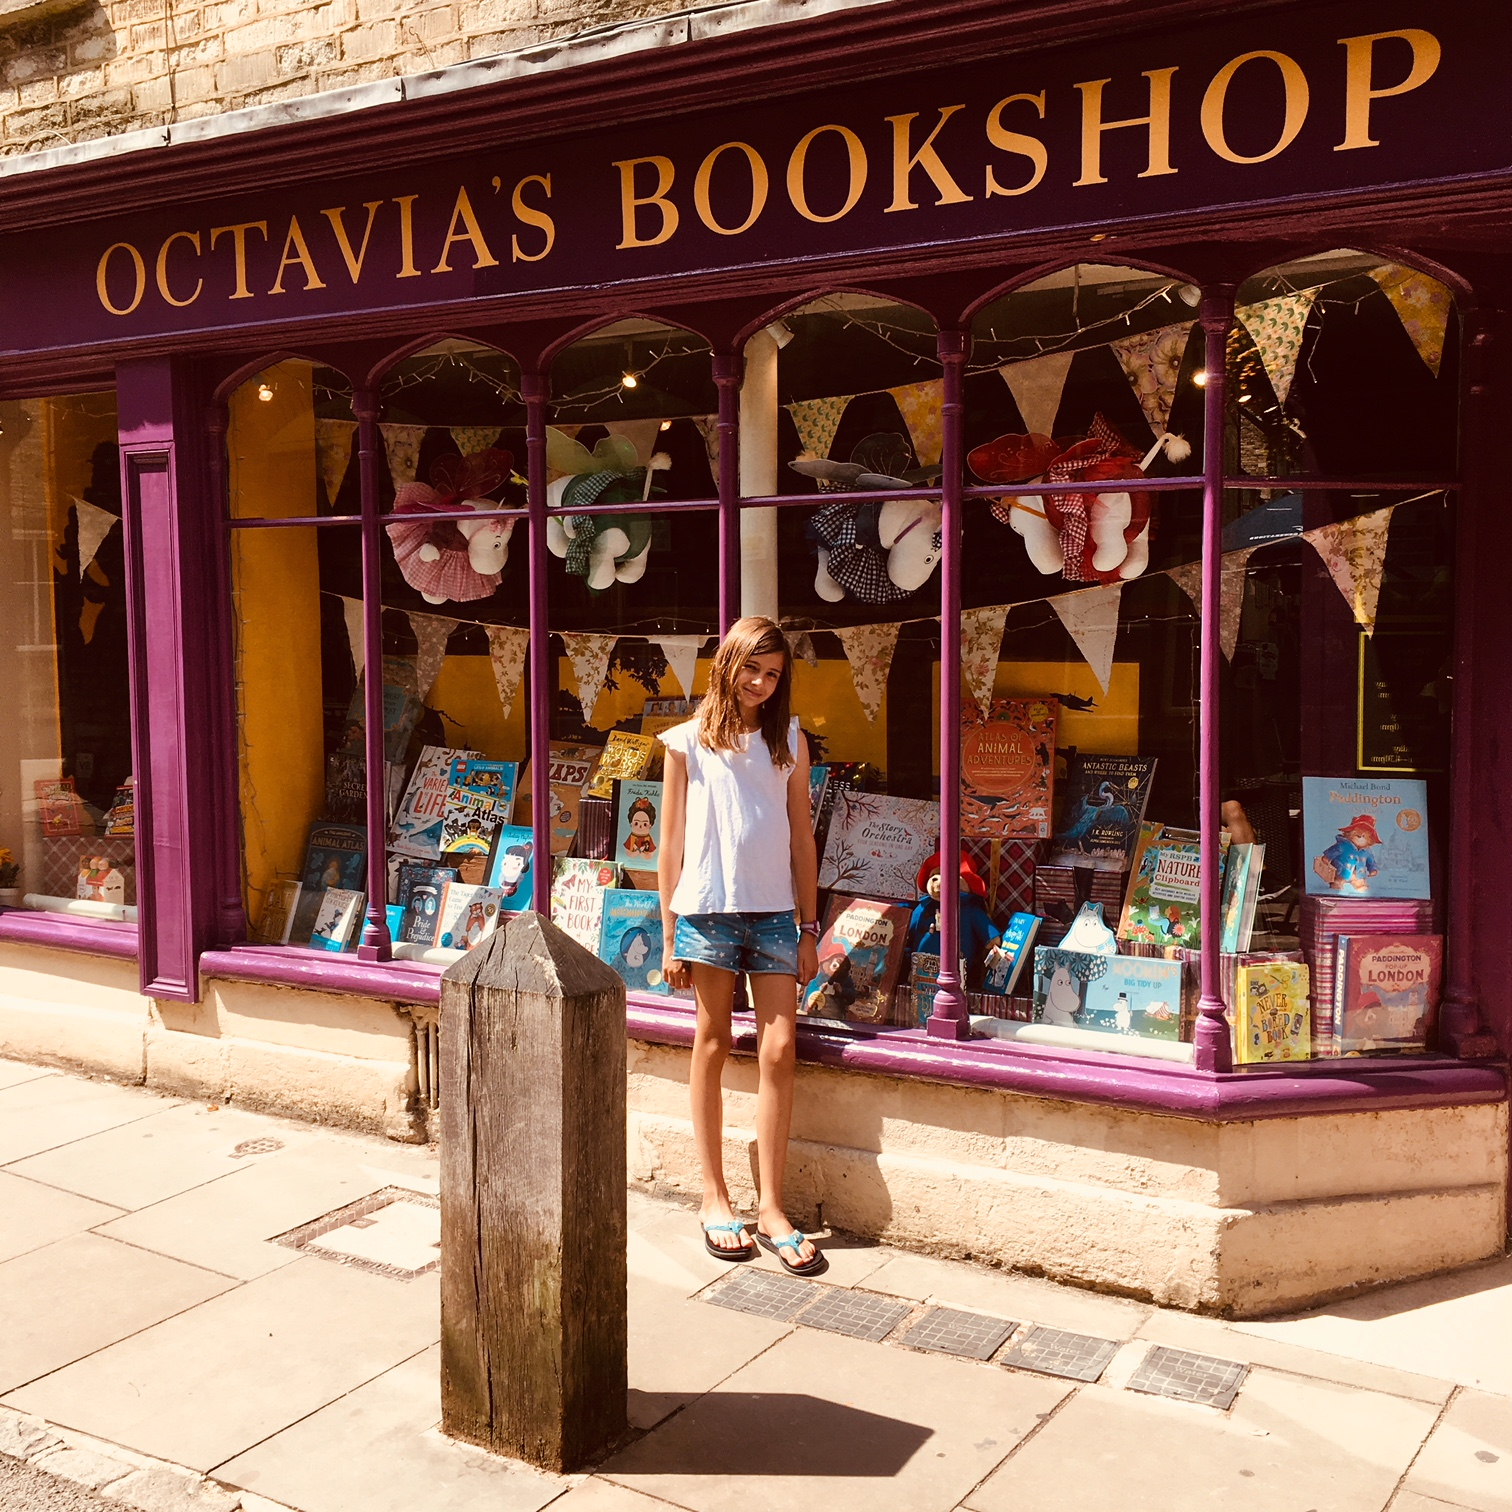 Octavia's Book shop, 24 Black Jack Street, Cirencester GL7 2AA